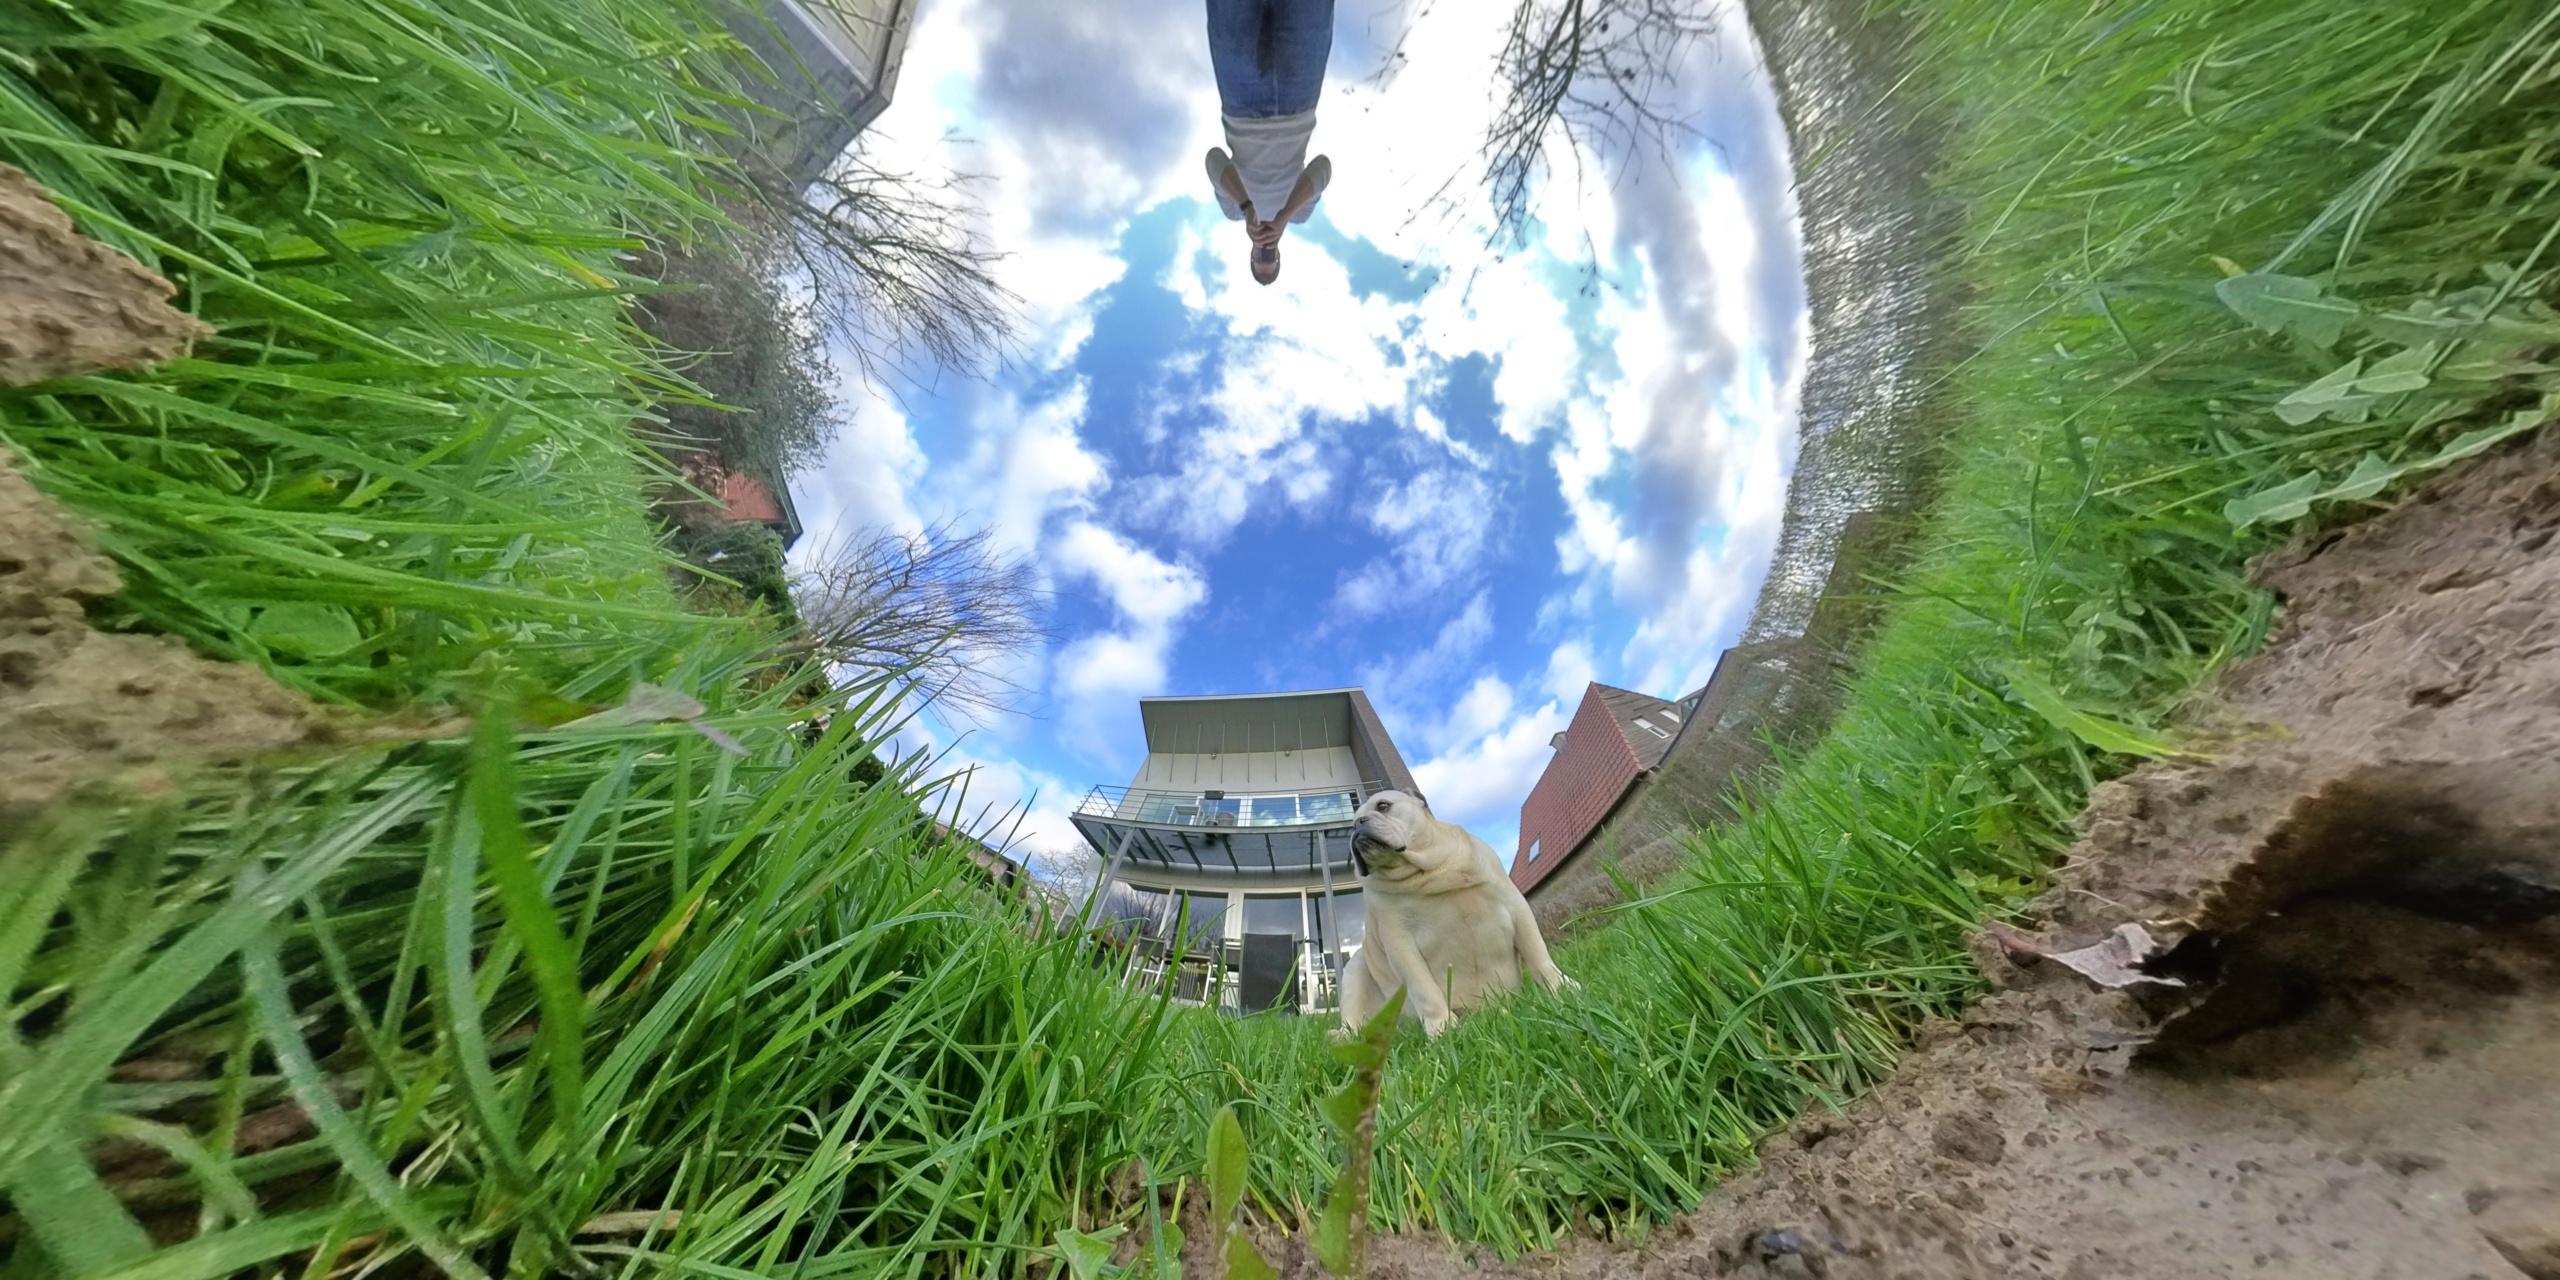 360° videography